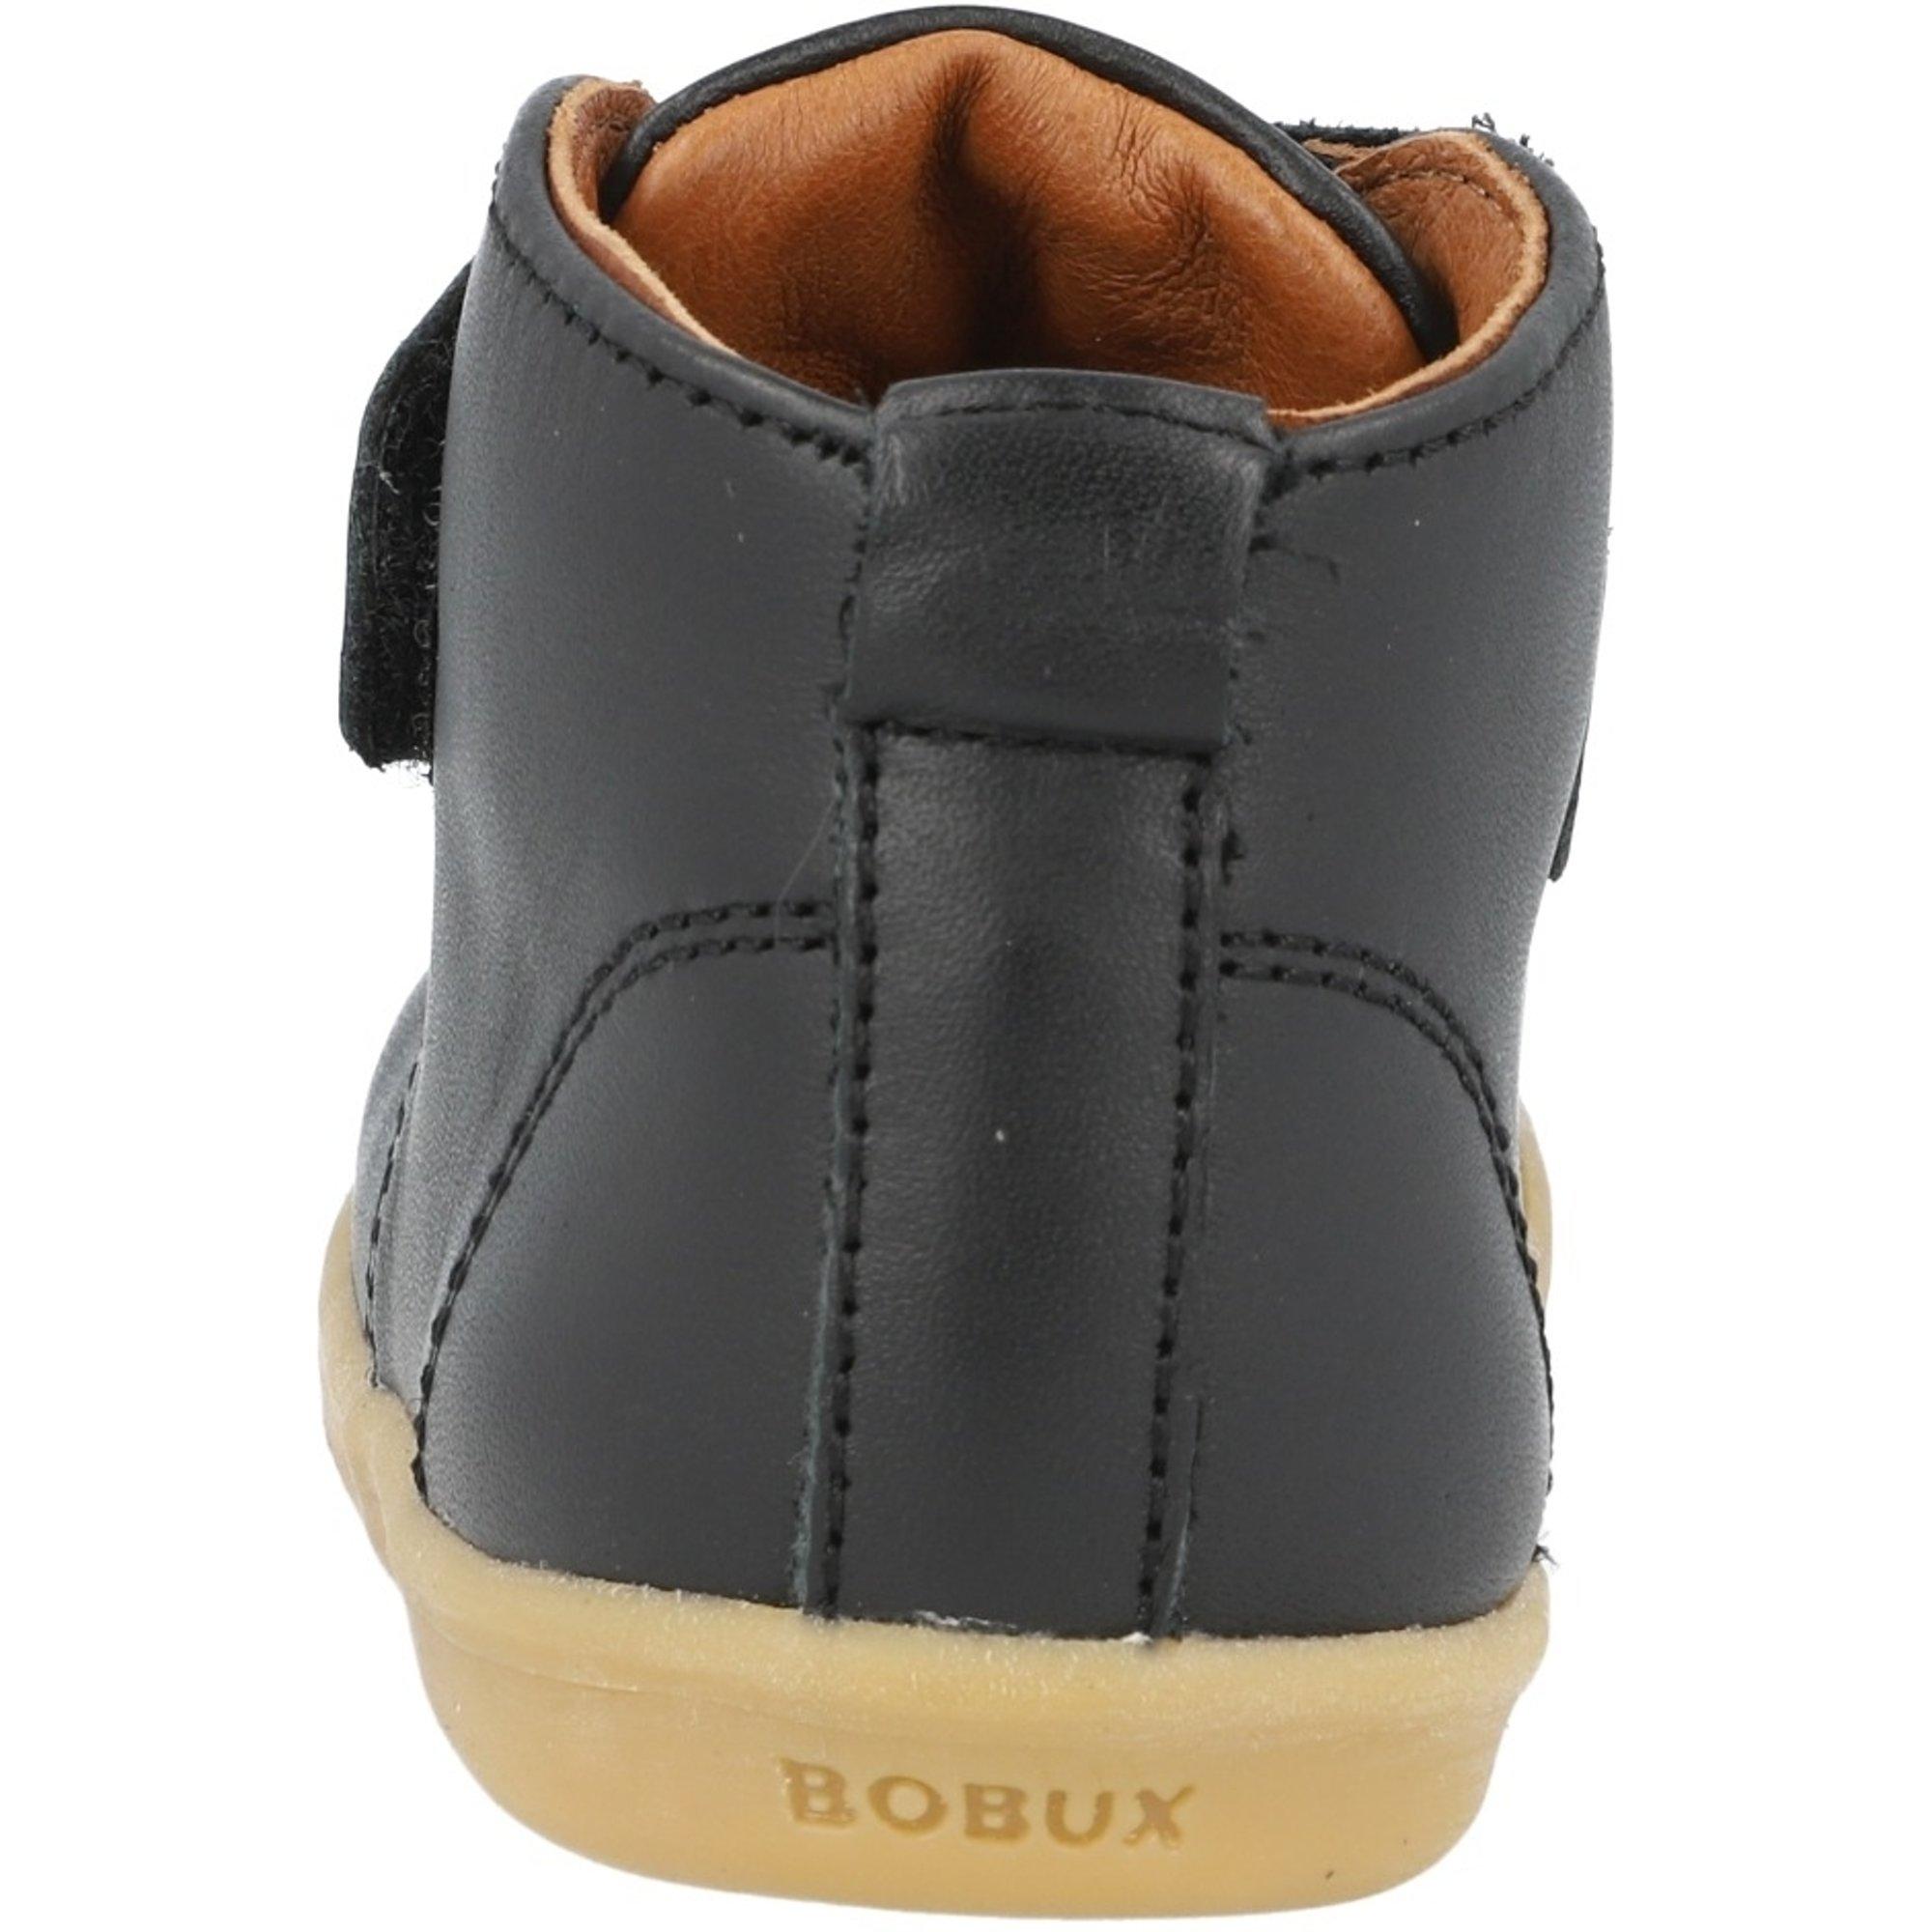 Bobux i-Walk Desert Black Leather